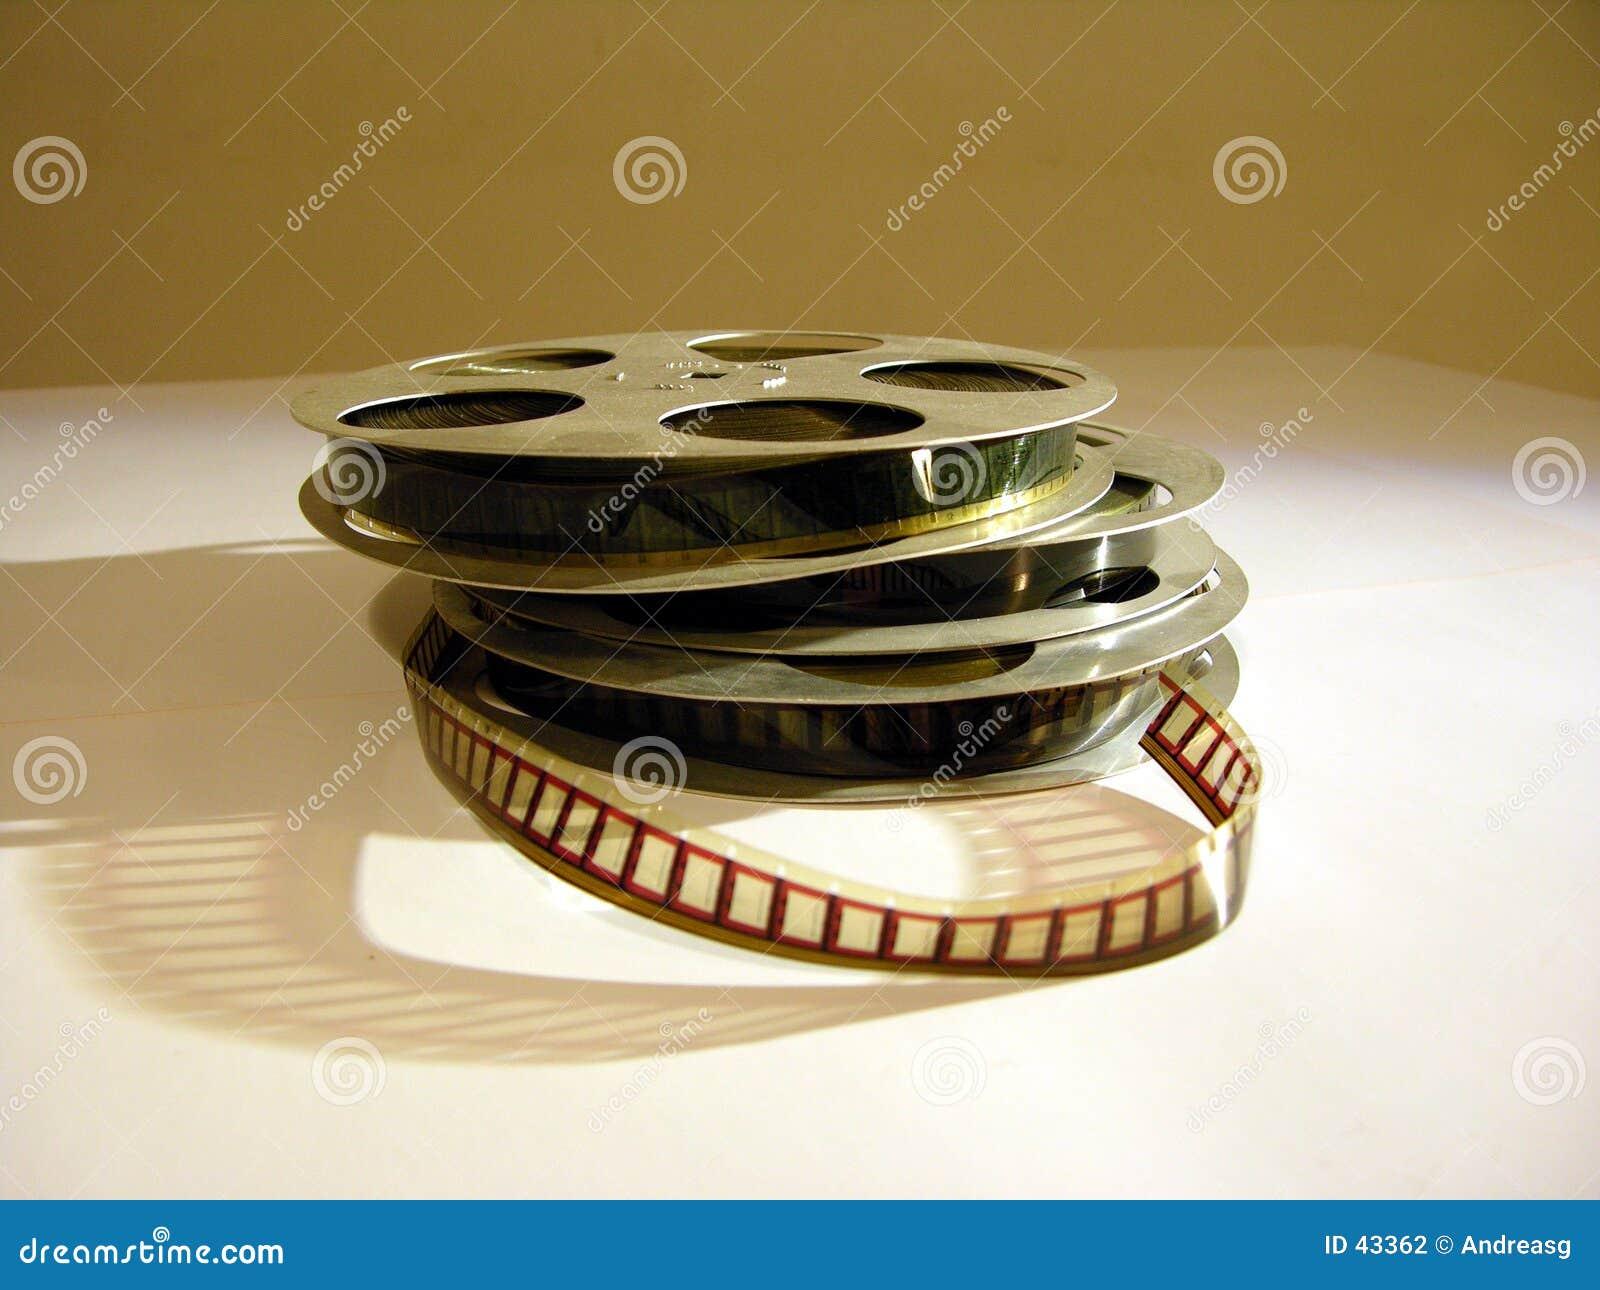 16mm films